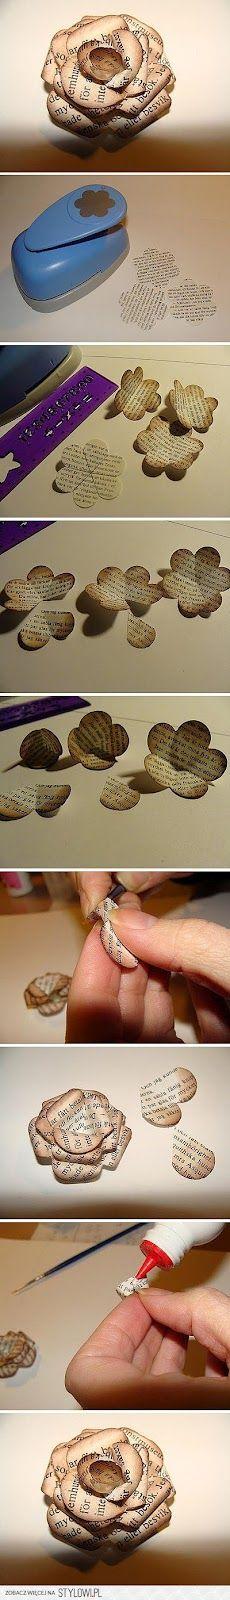 http://reciclagemjardinagemedecoracao.blogspot.com.br/search/label/Craft / Diy?updated-max=2012-09-23T02:48:00-07:00